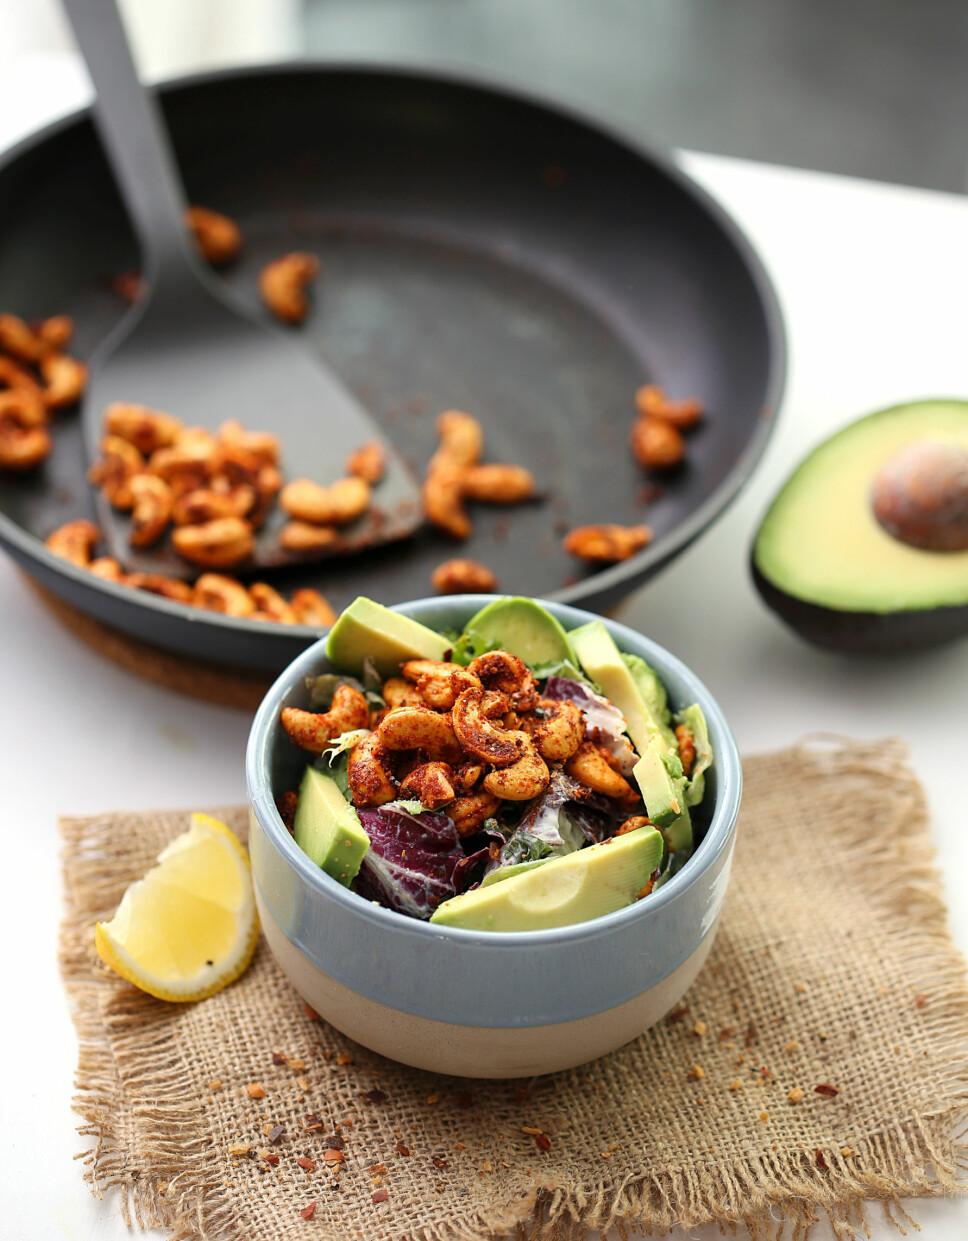 Chipotle cashewnøtt-salat med avokado